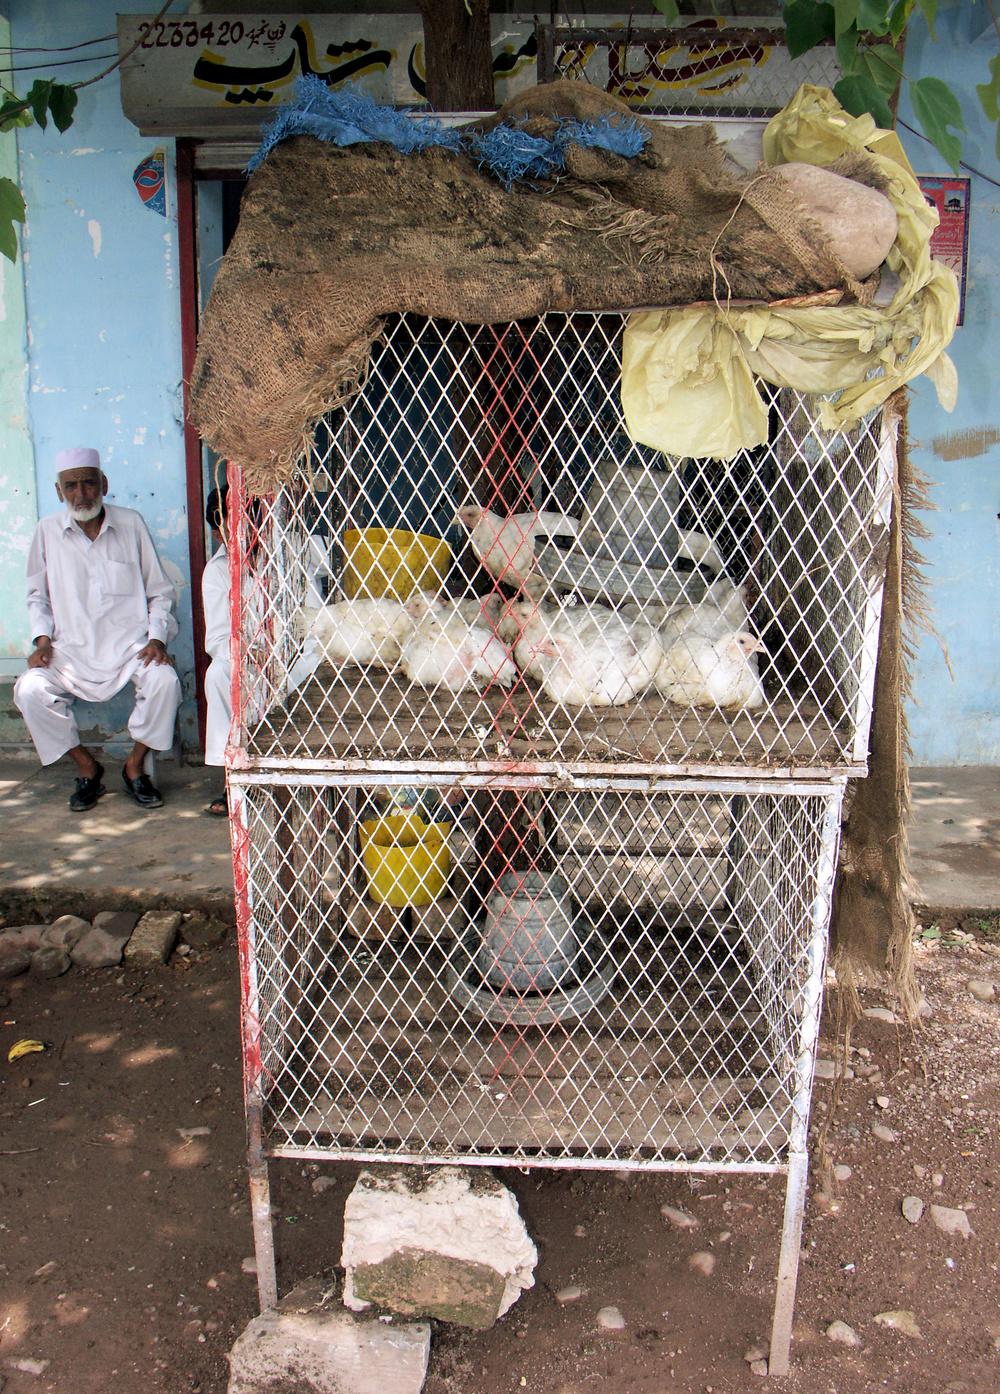 035 PB Poultry shop.jpg